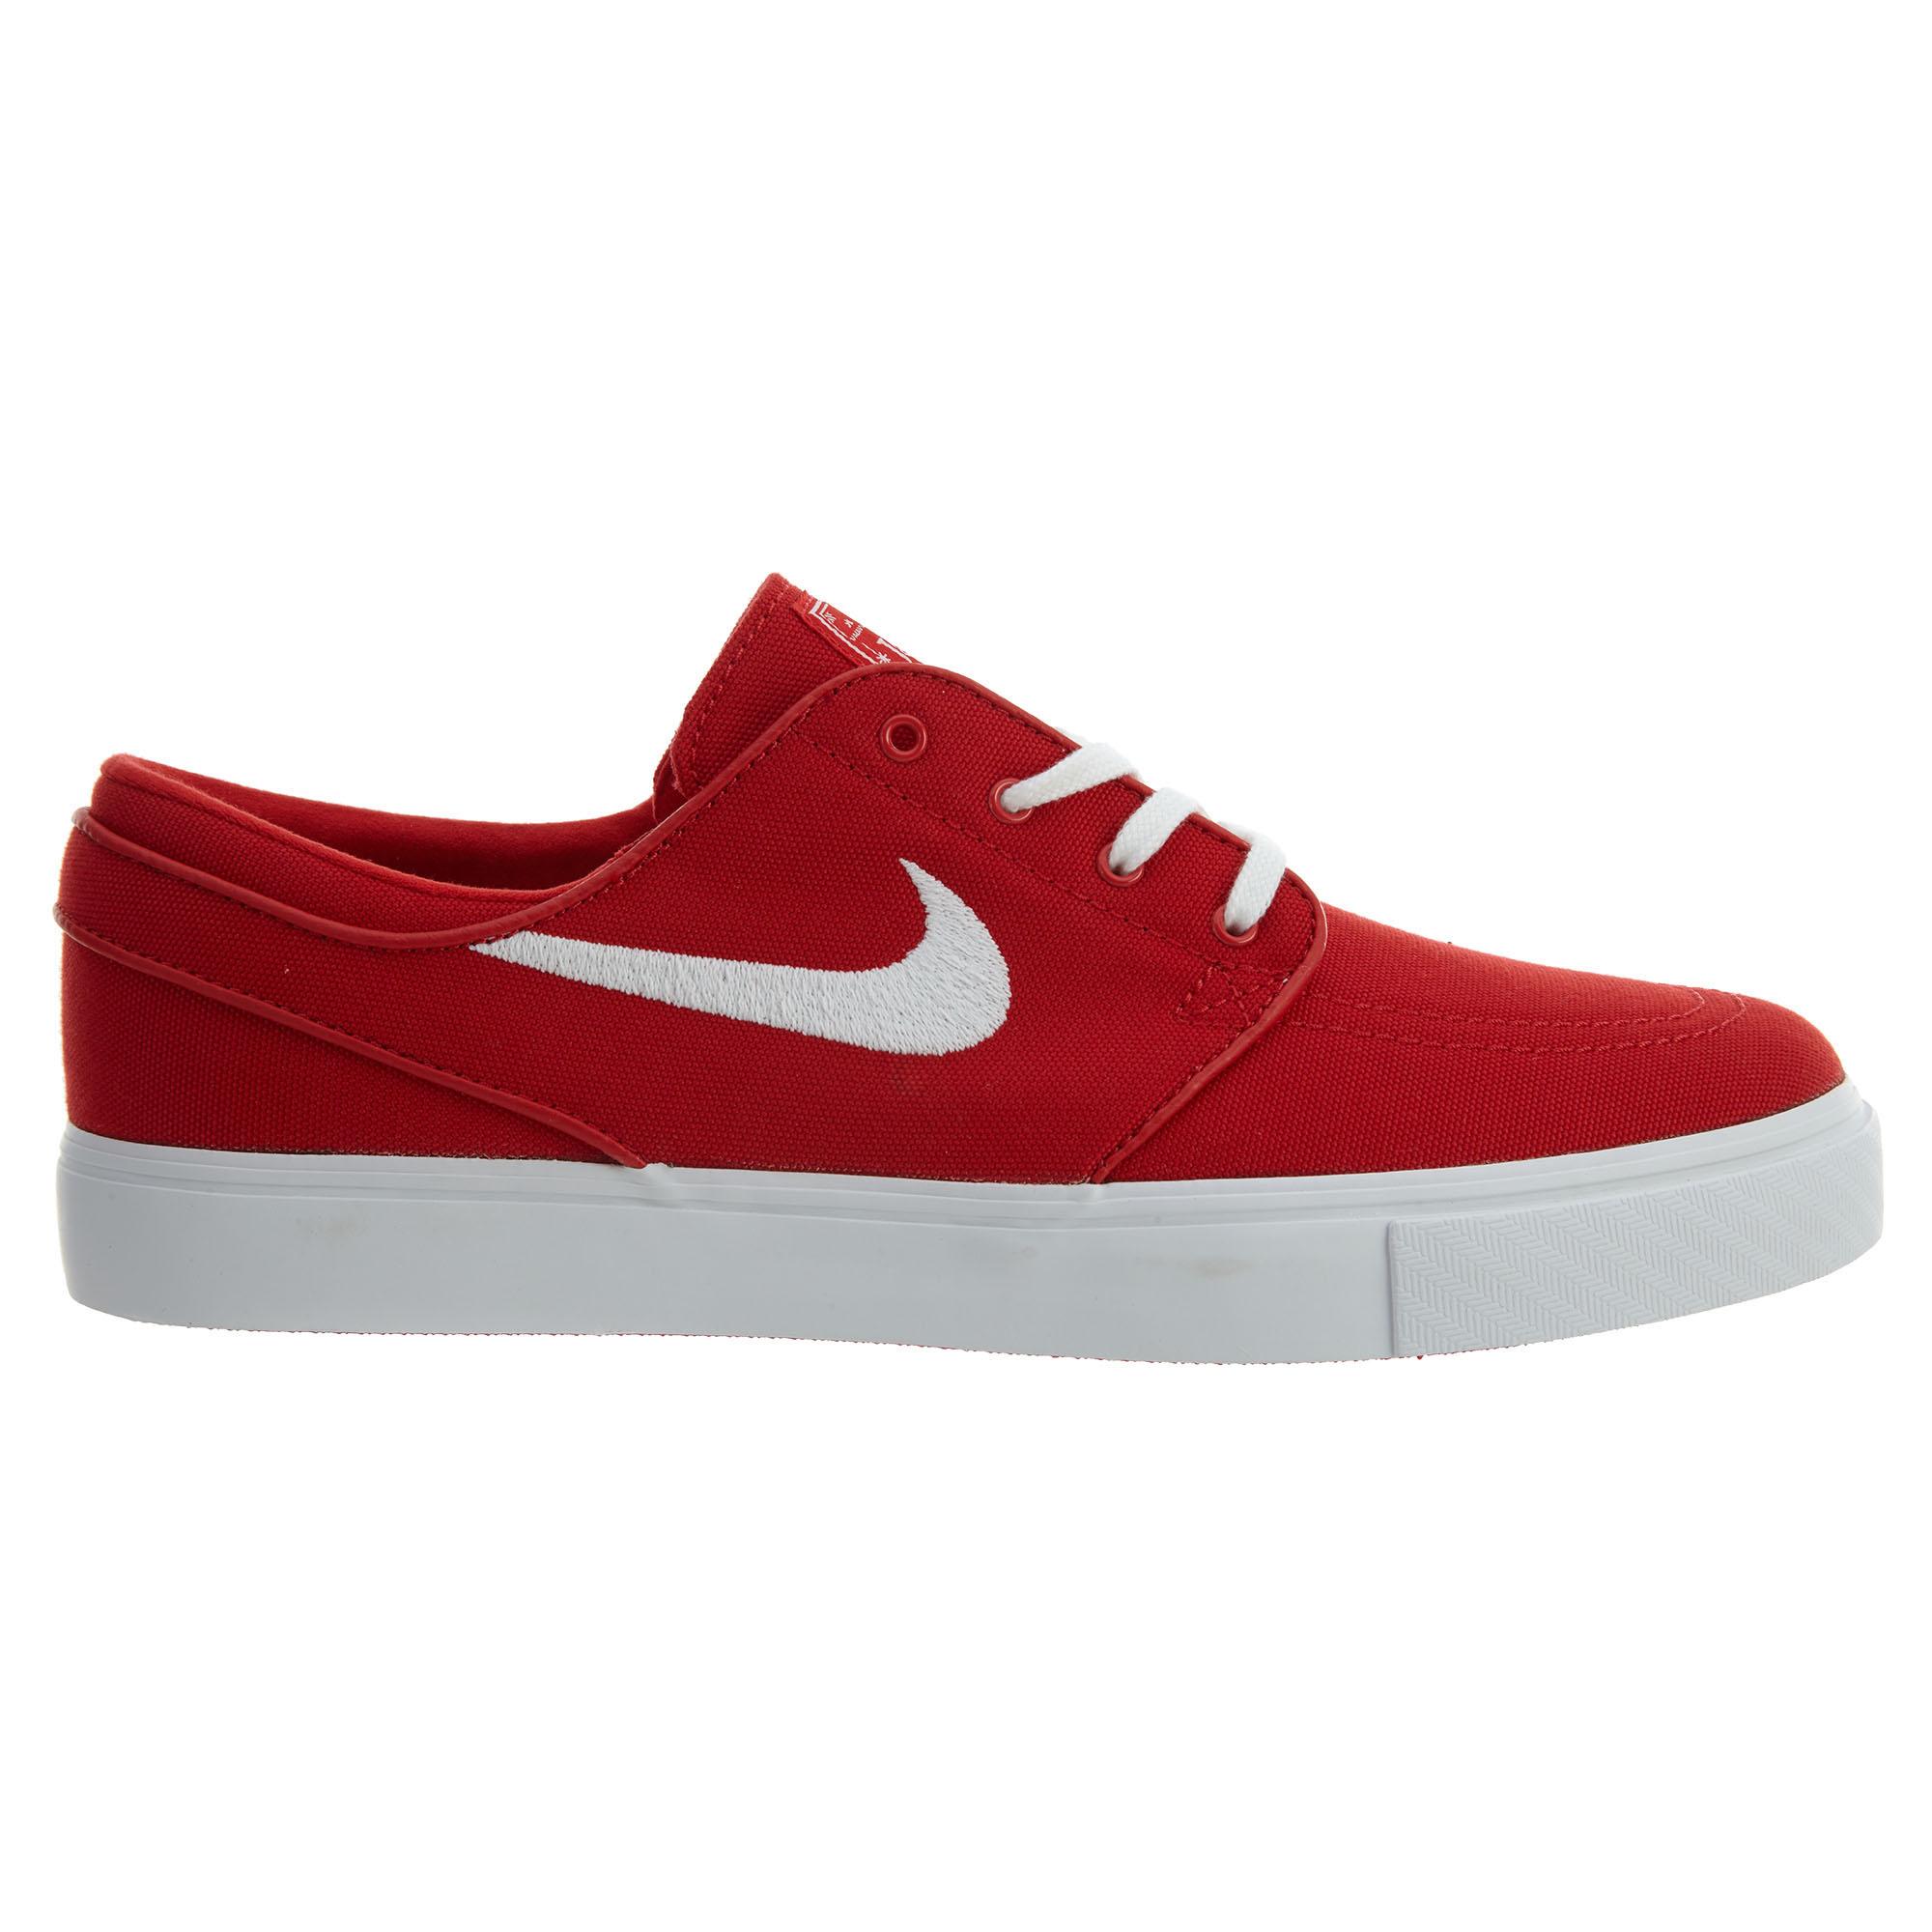 Nike Zoom Stefan Janoski Cnvs University Red/White - 615957-614